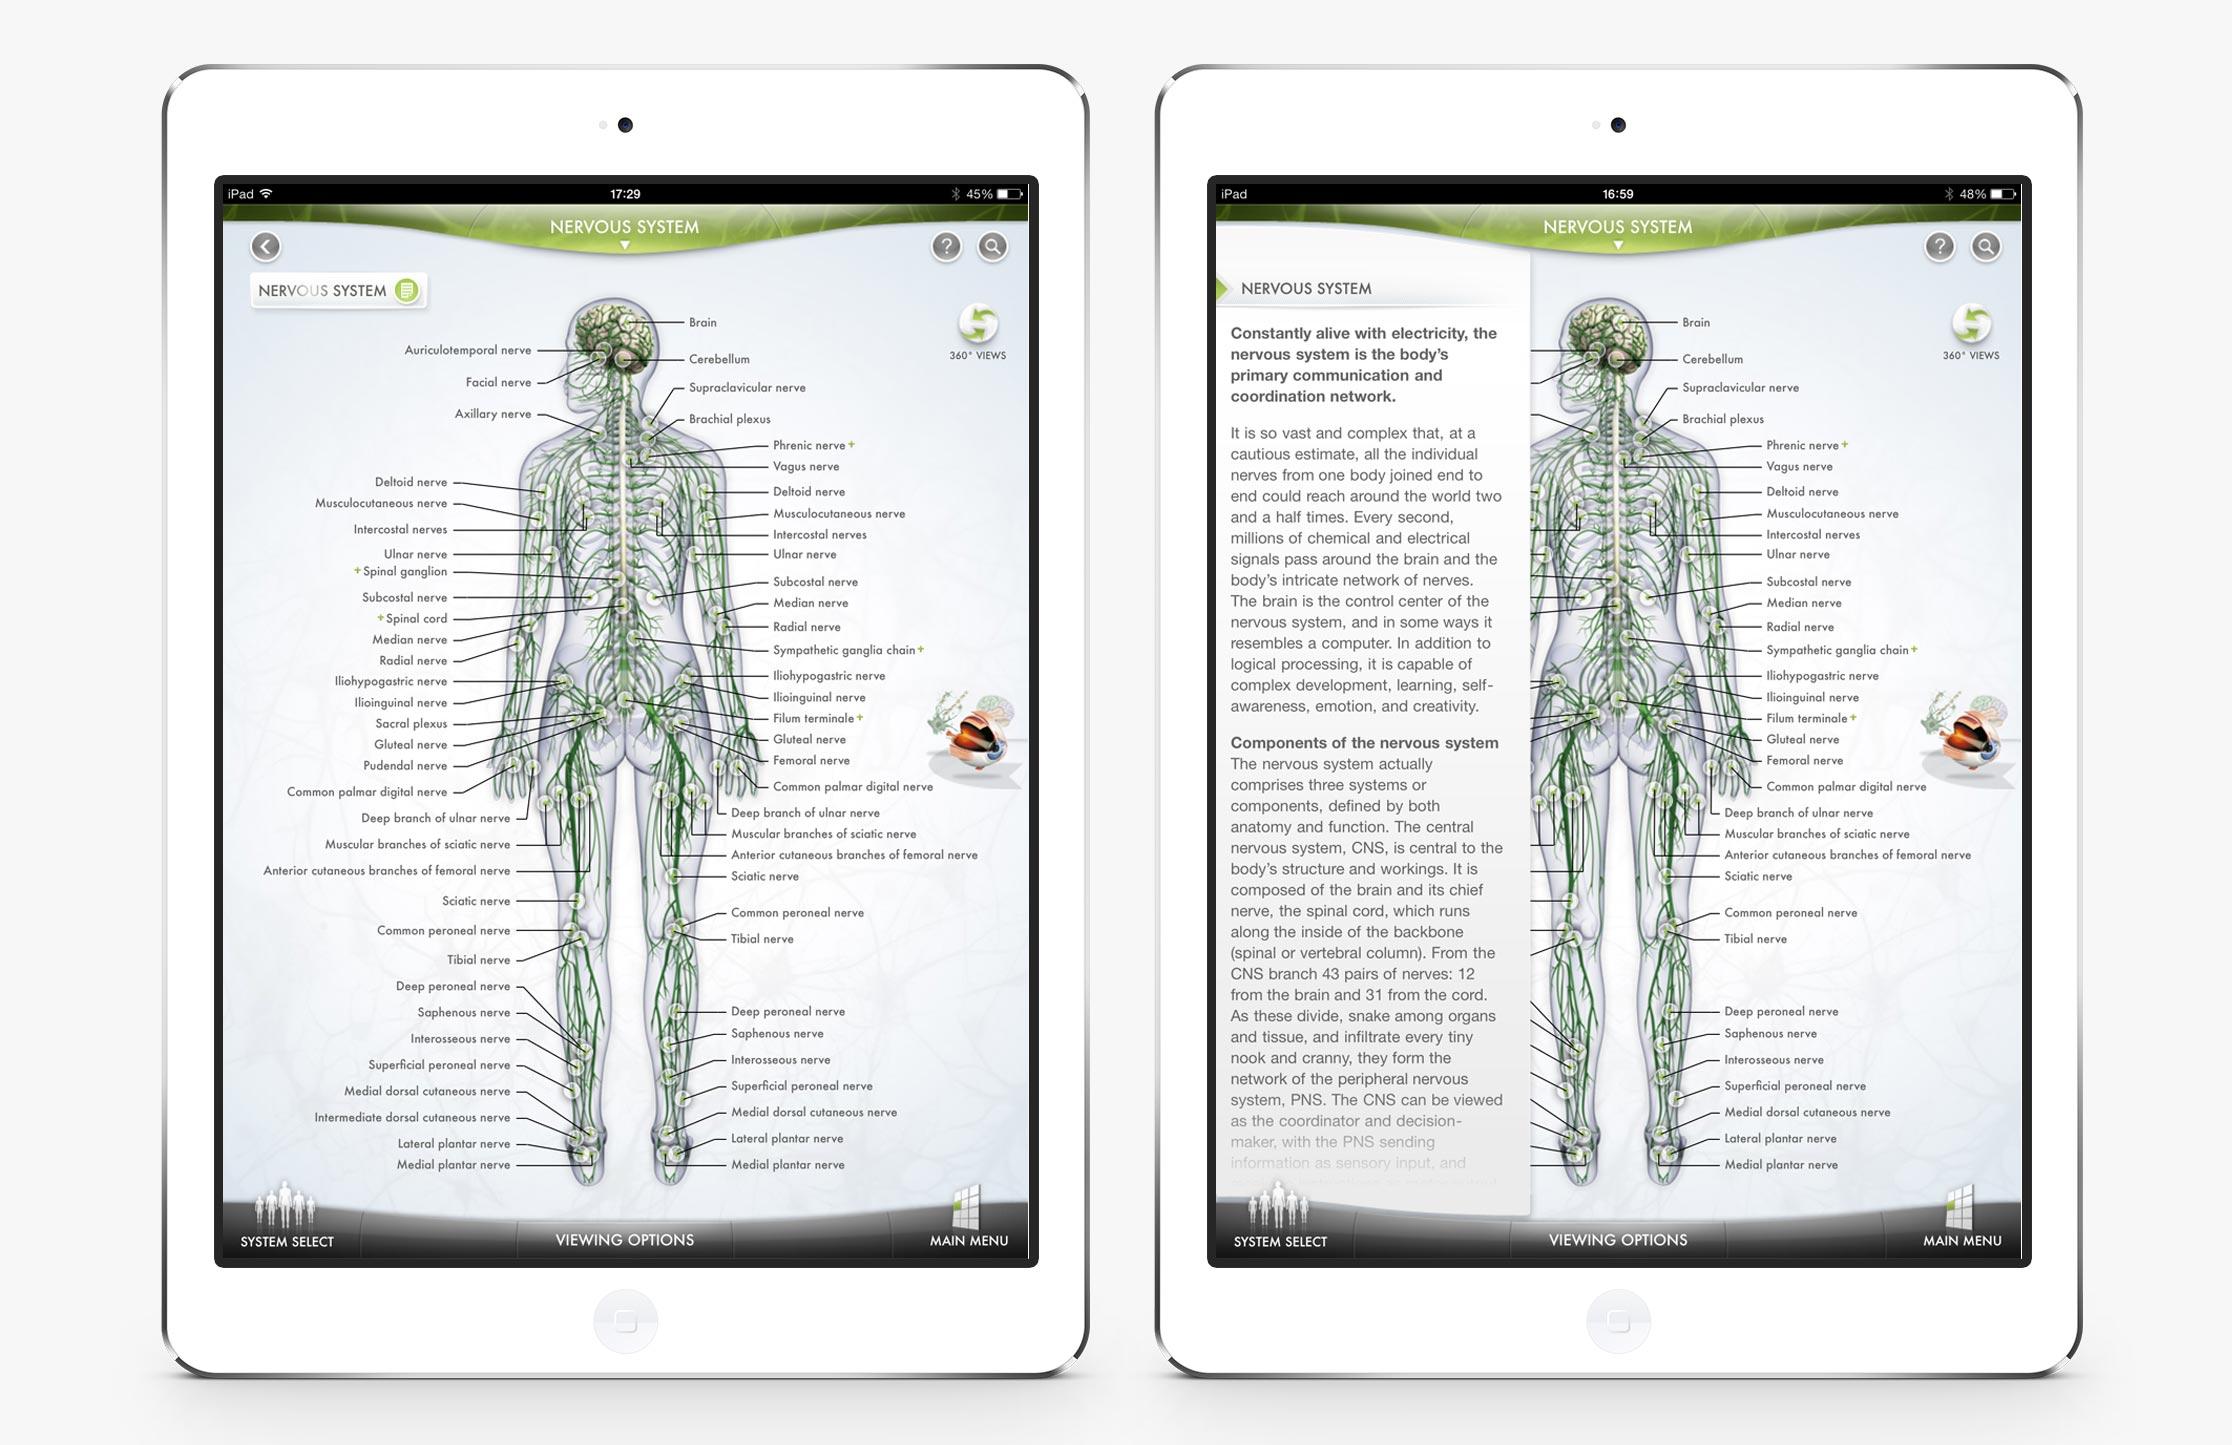 The-Human-Body-2.jpg